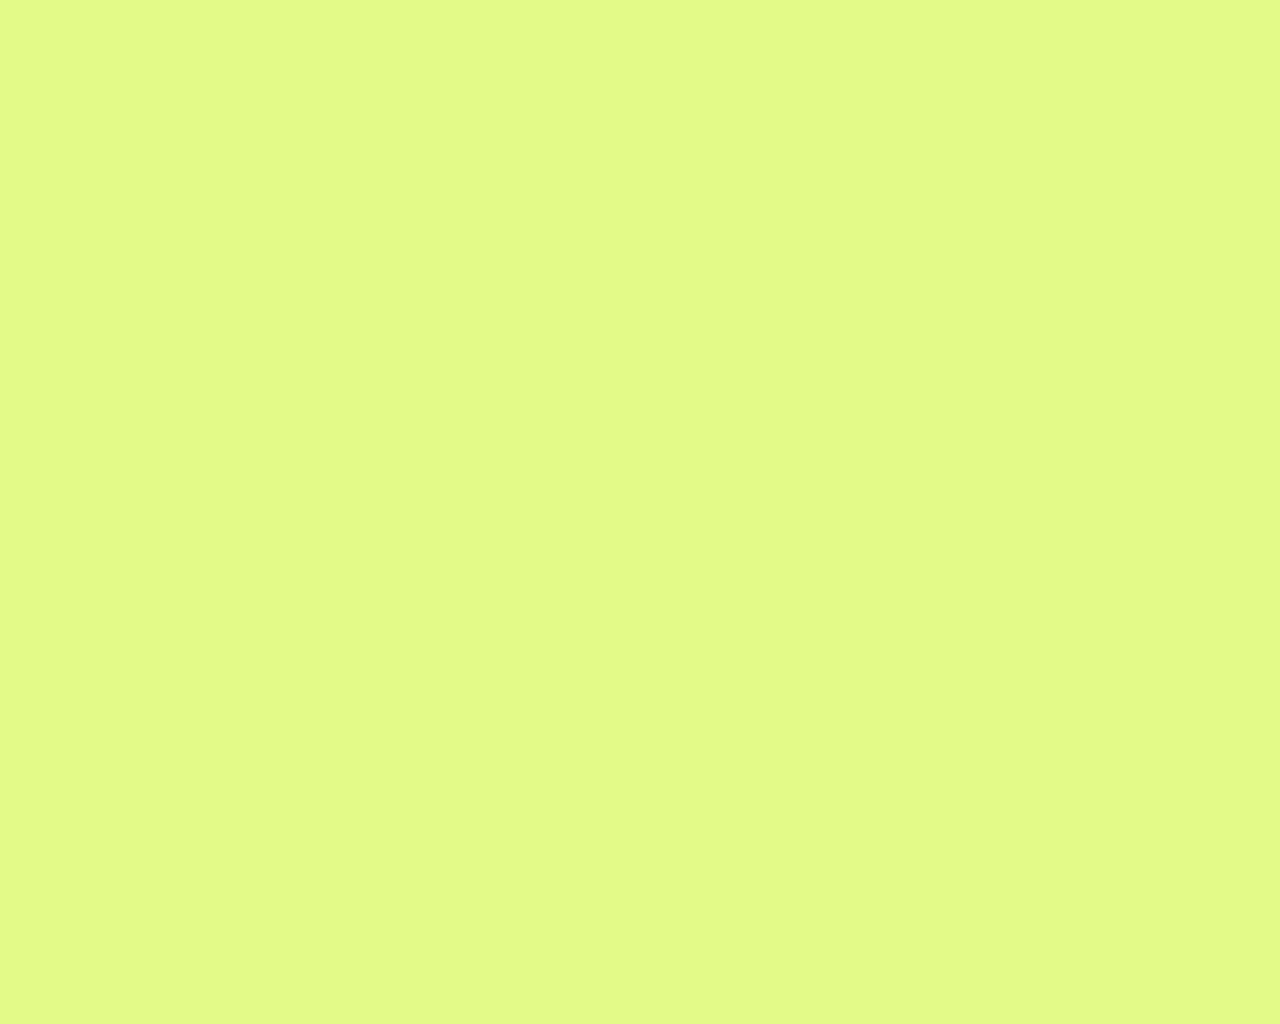 1280x1024 Midori Solid Color Background